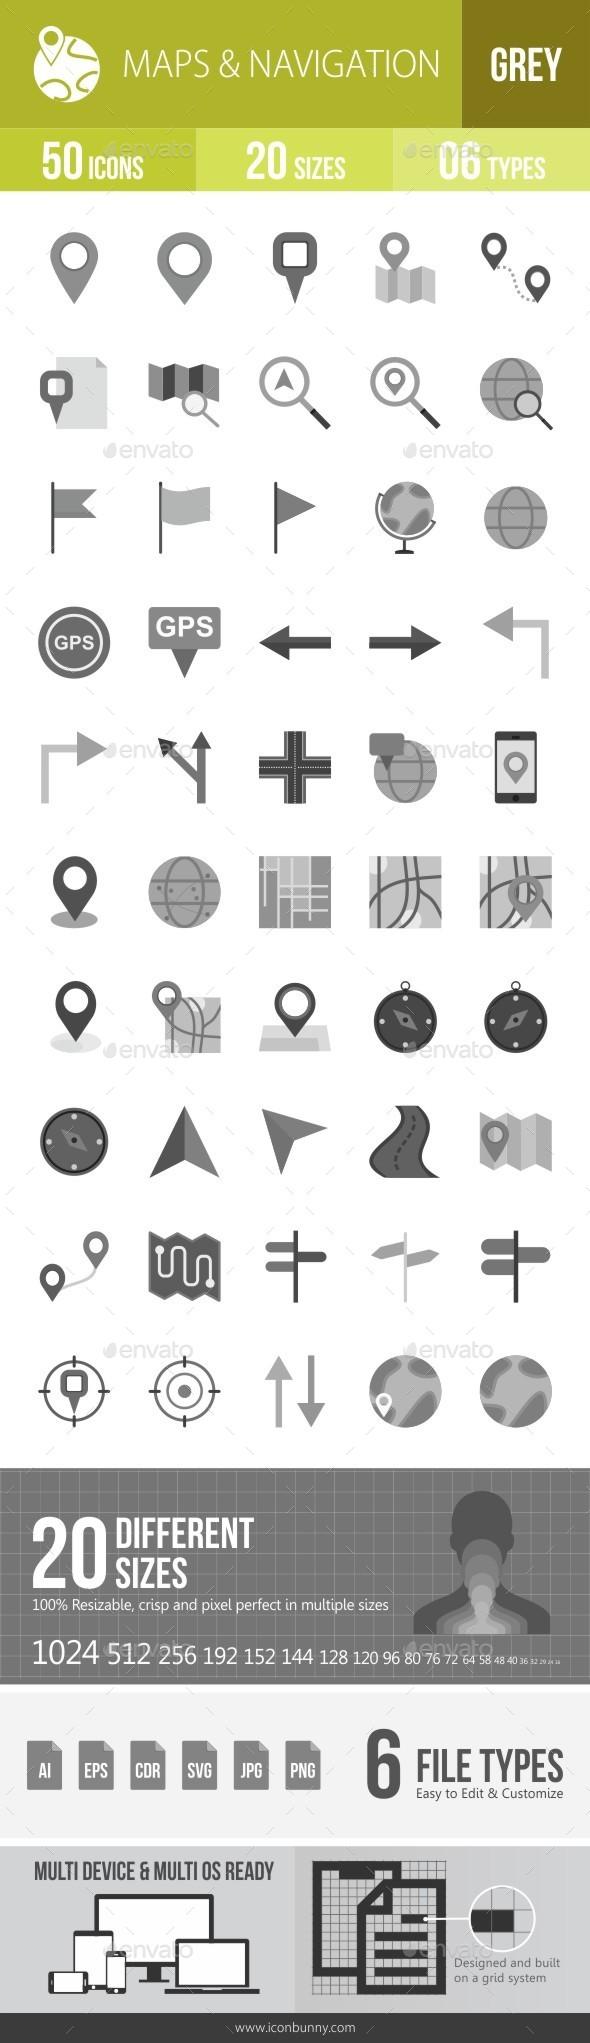 Maps & Navigation Greyscale Icons - Icons